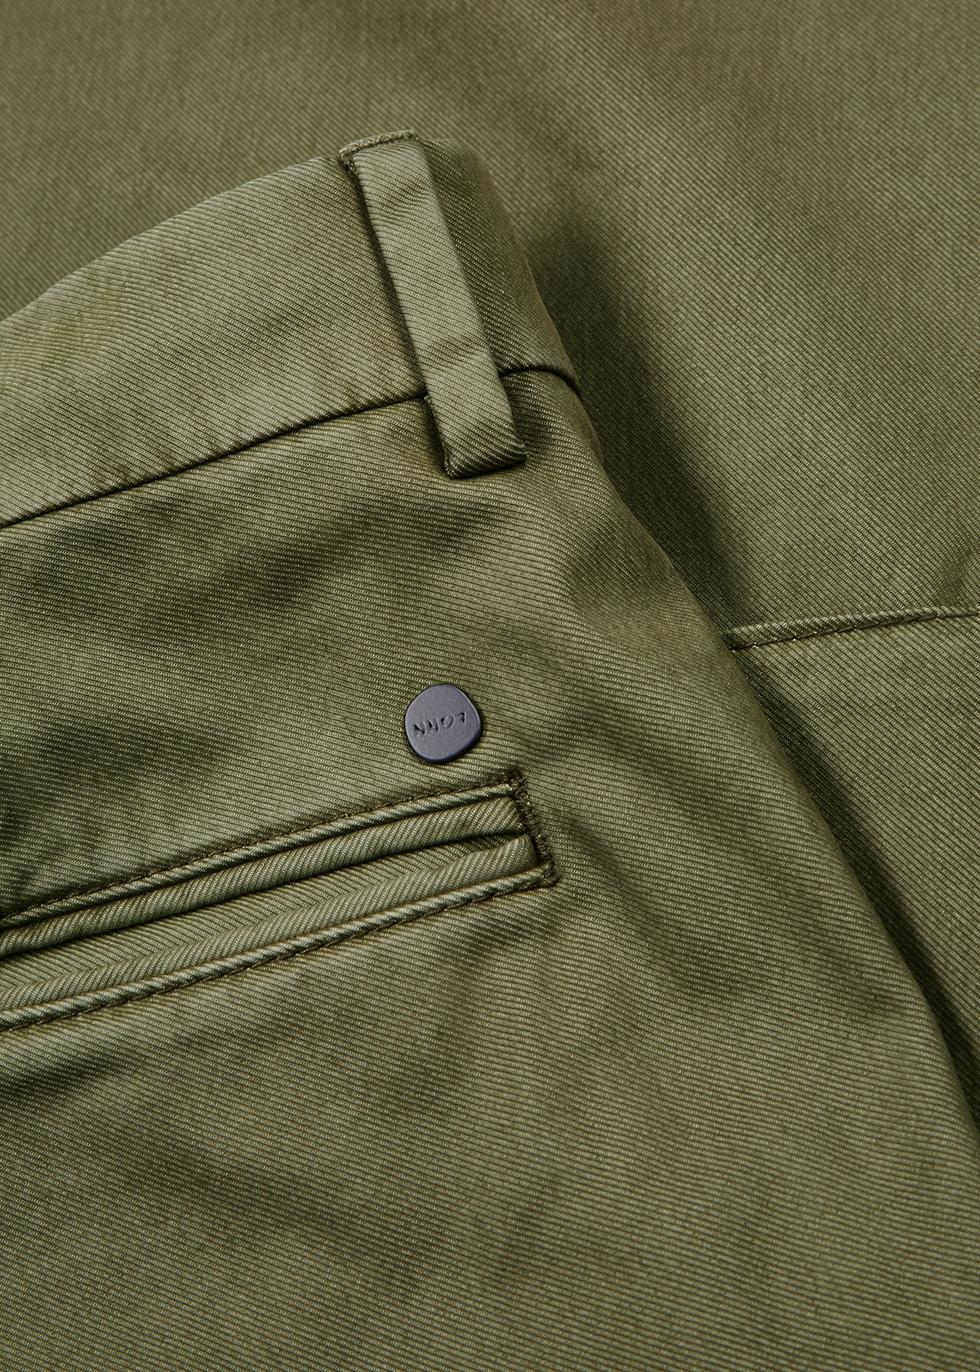 Django olive twill cargo trousers - NN07